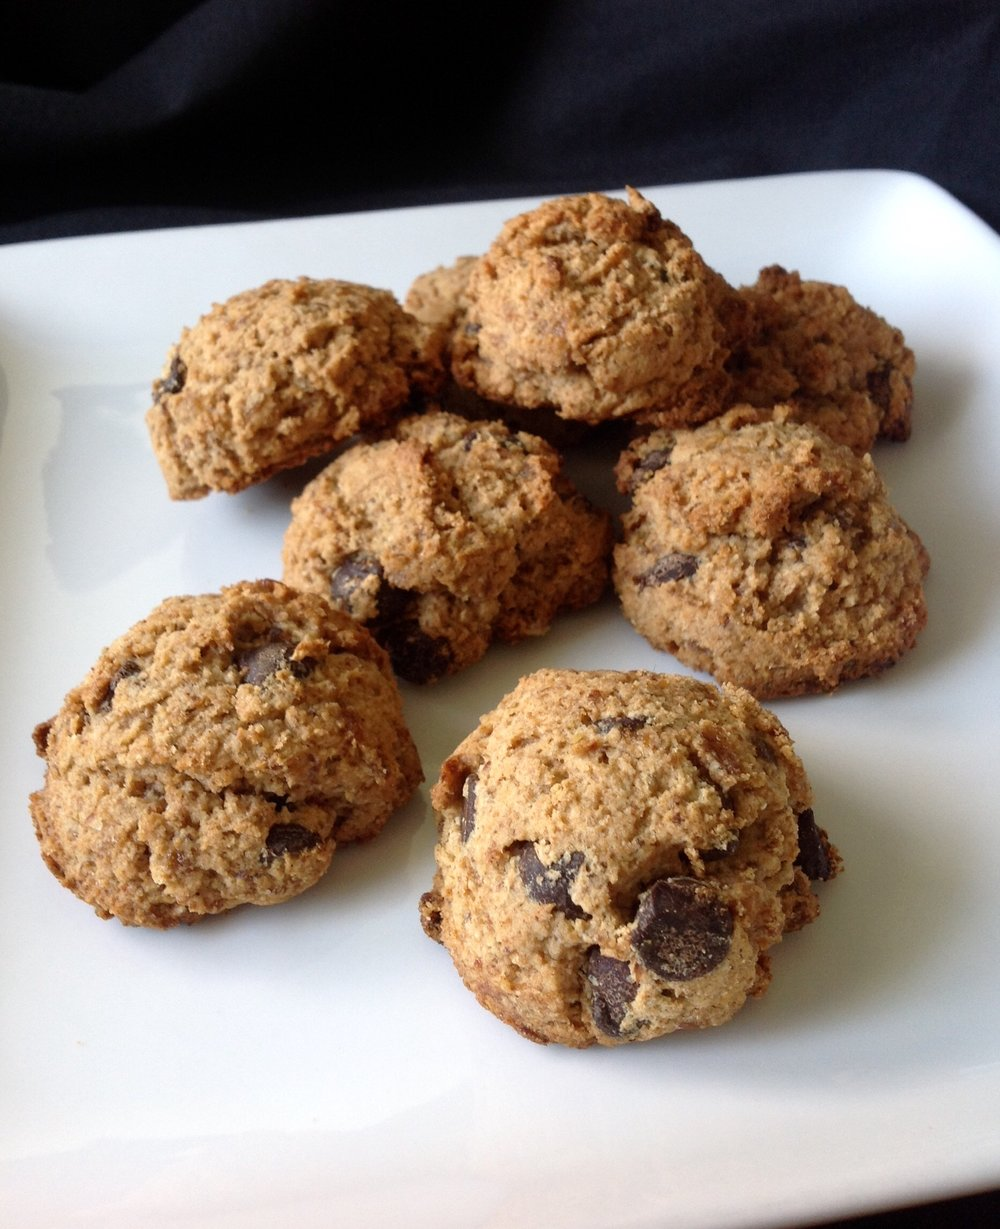 Whole Grain, Vegan Chocolate Chip Cookies